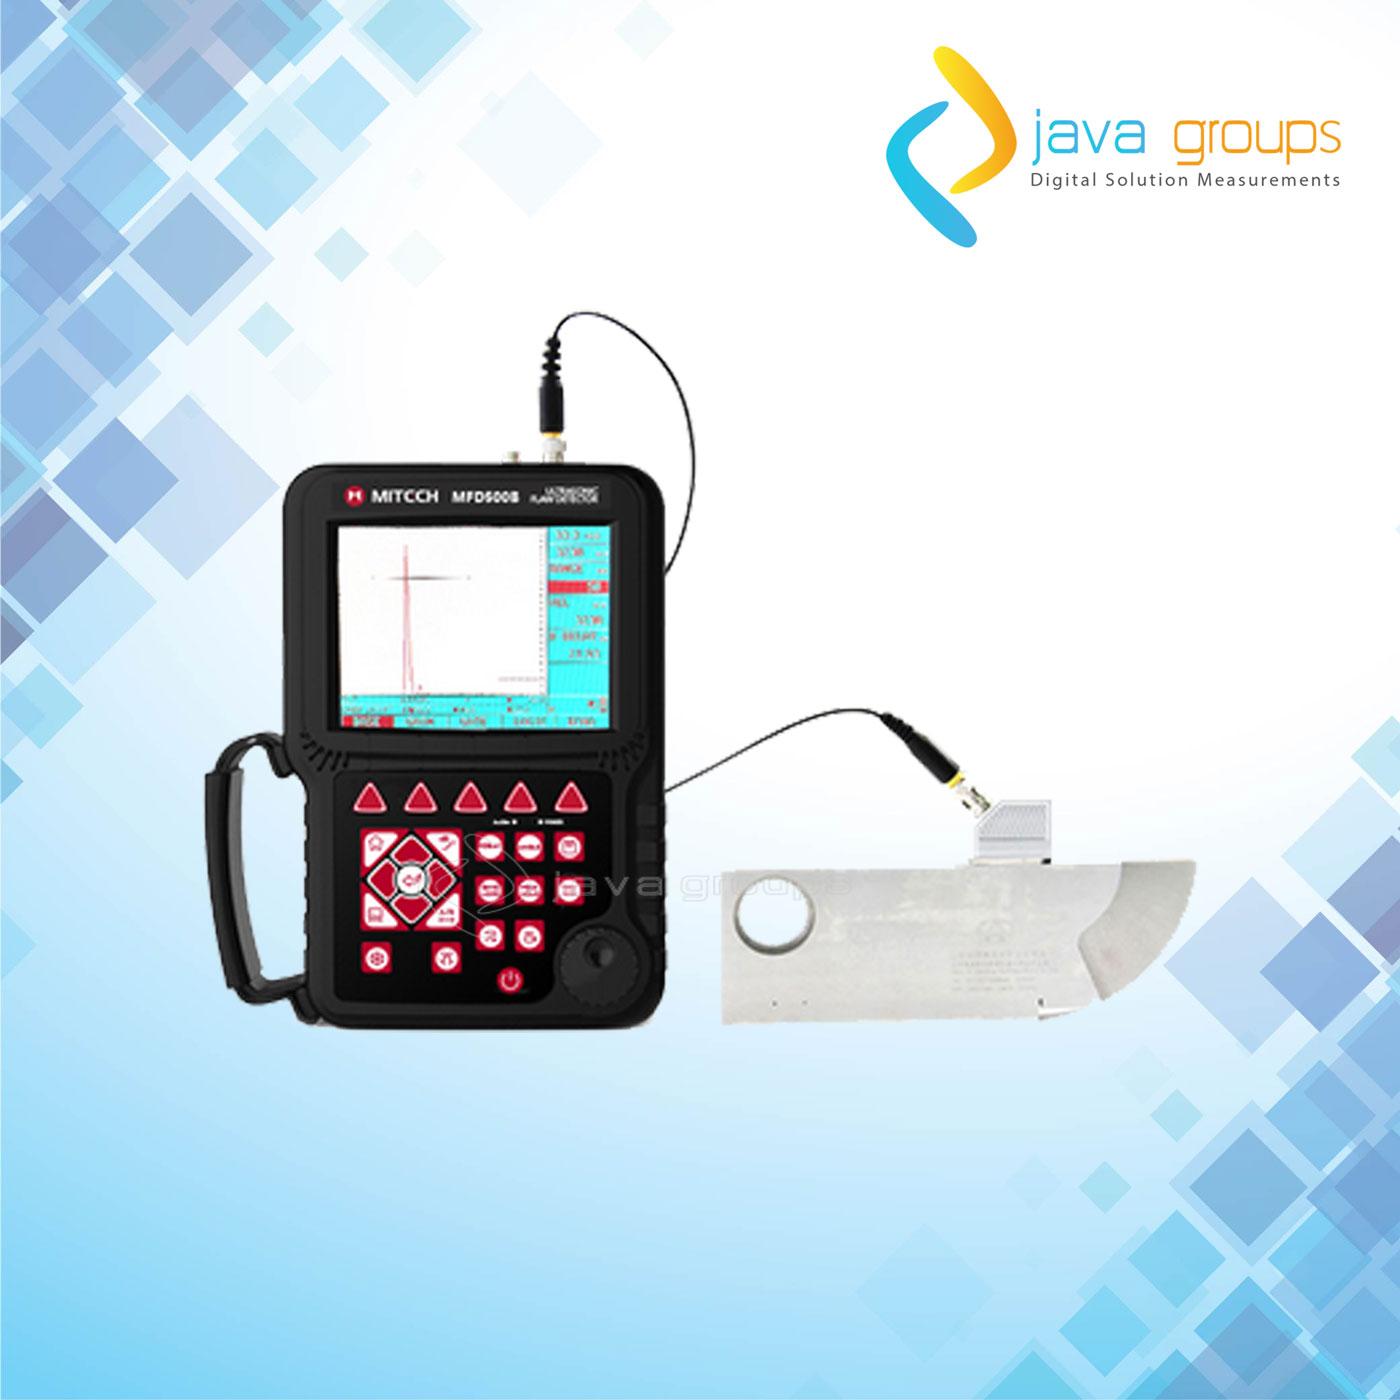 Alat Ultrasonic Pendeteksi Kecacatan Mitech MFD500B